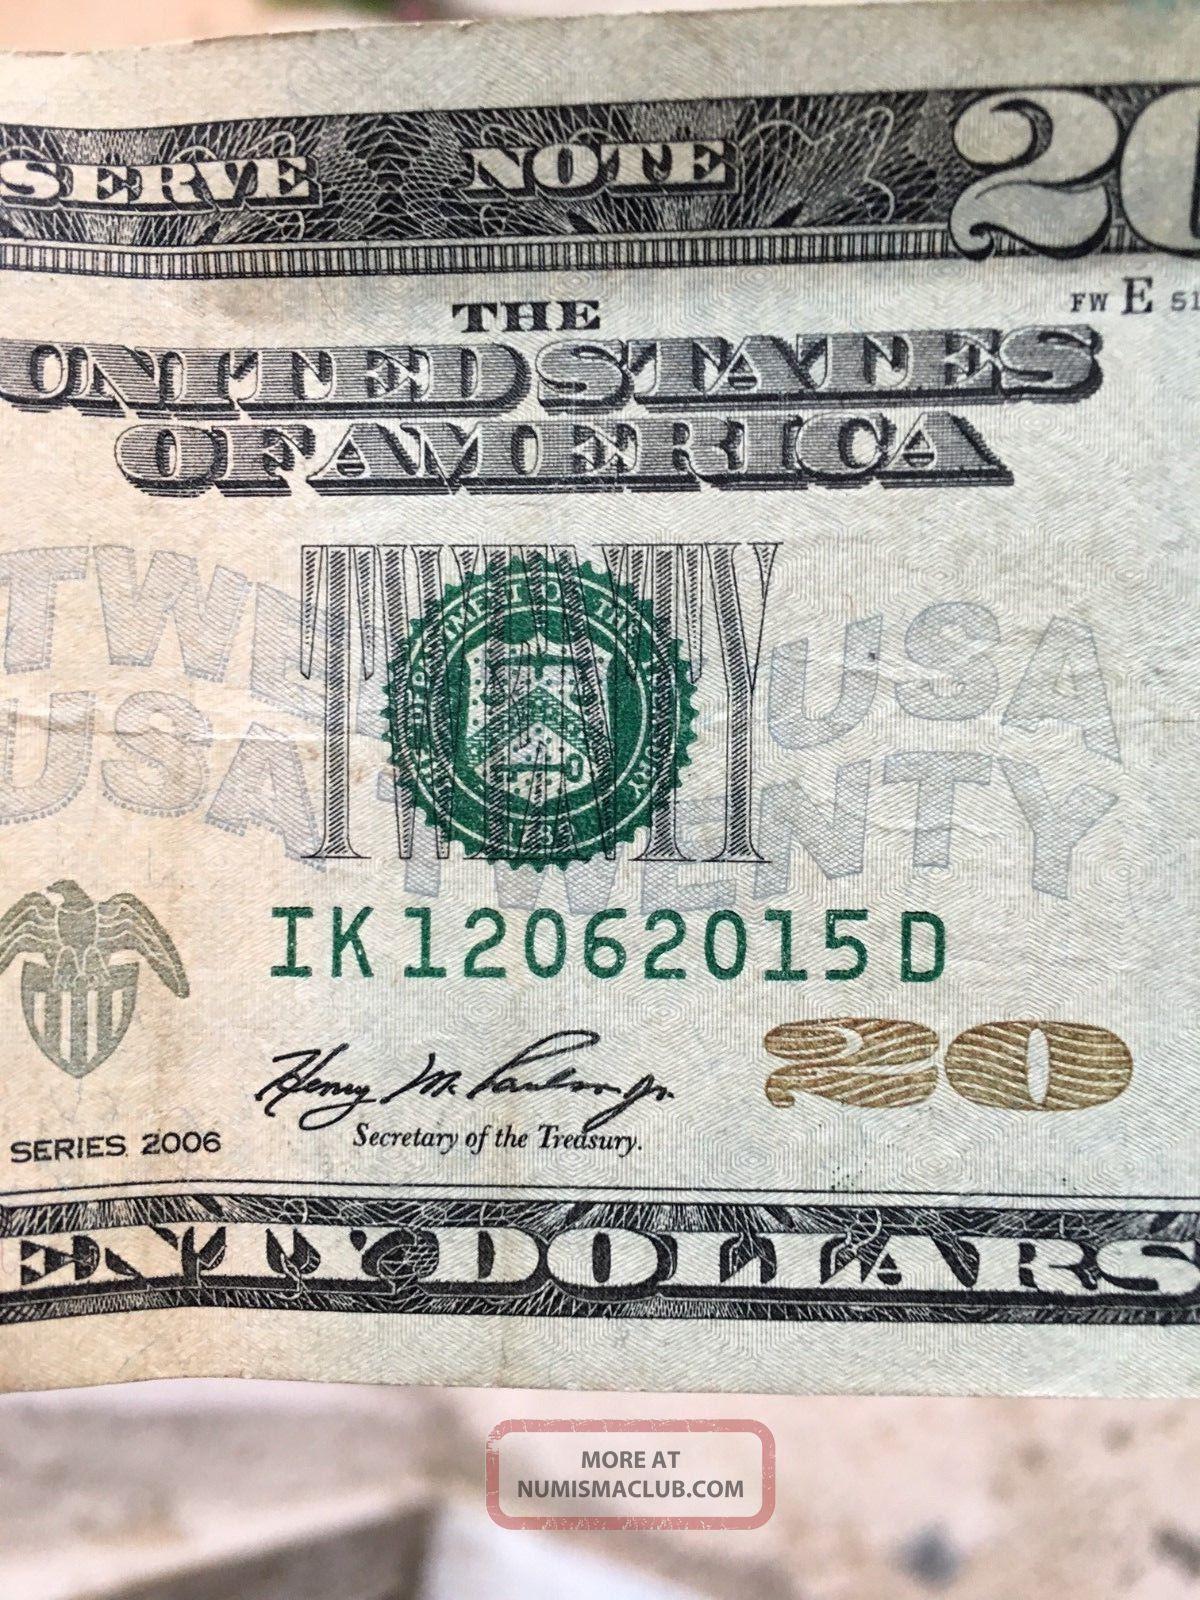 series date on dollar bill